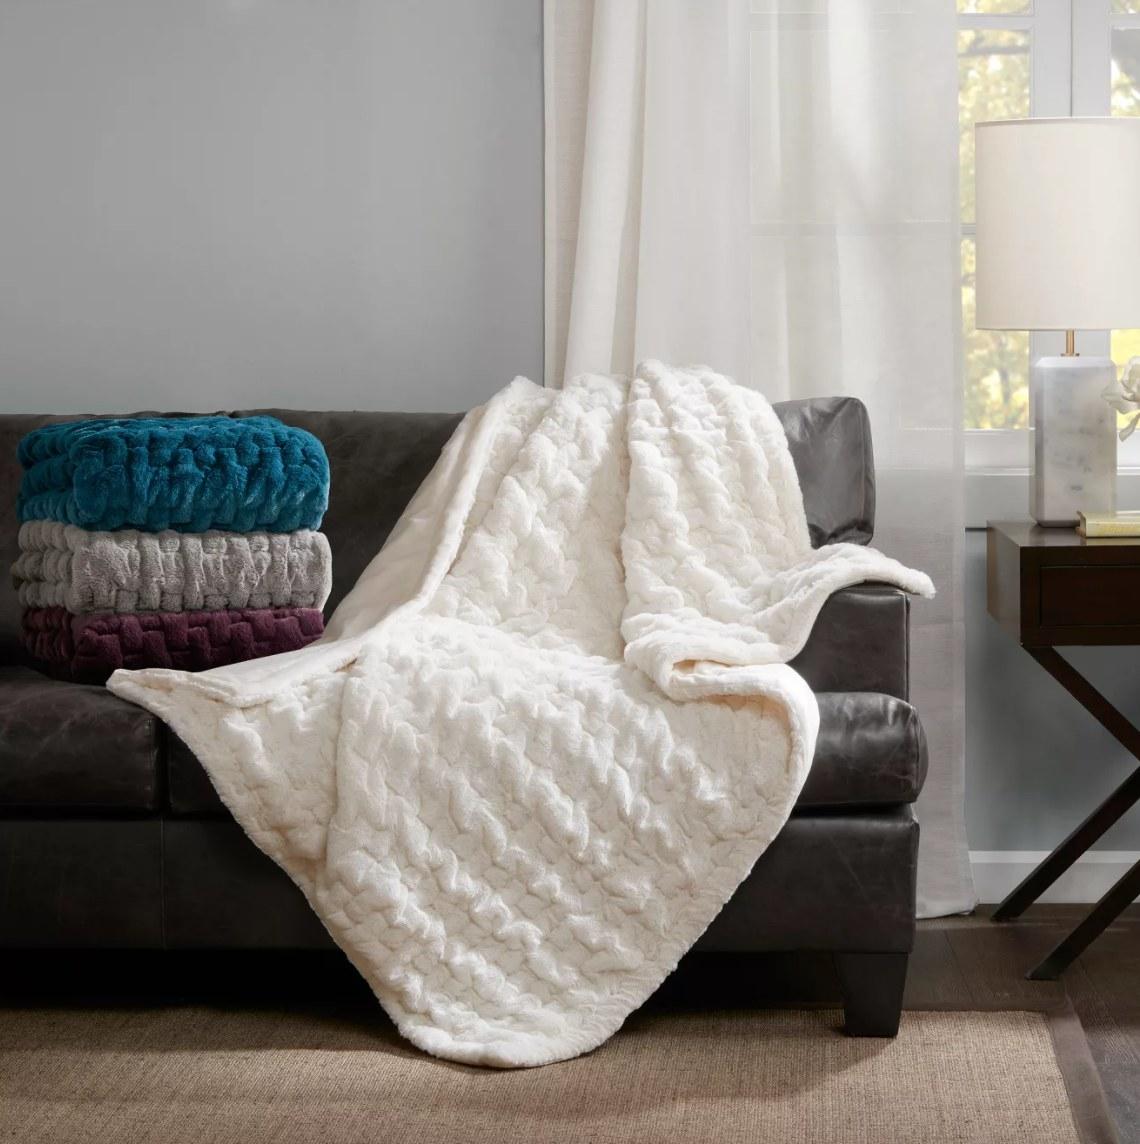 A white faux fur blanket laying across a sofa